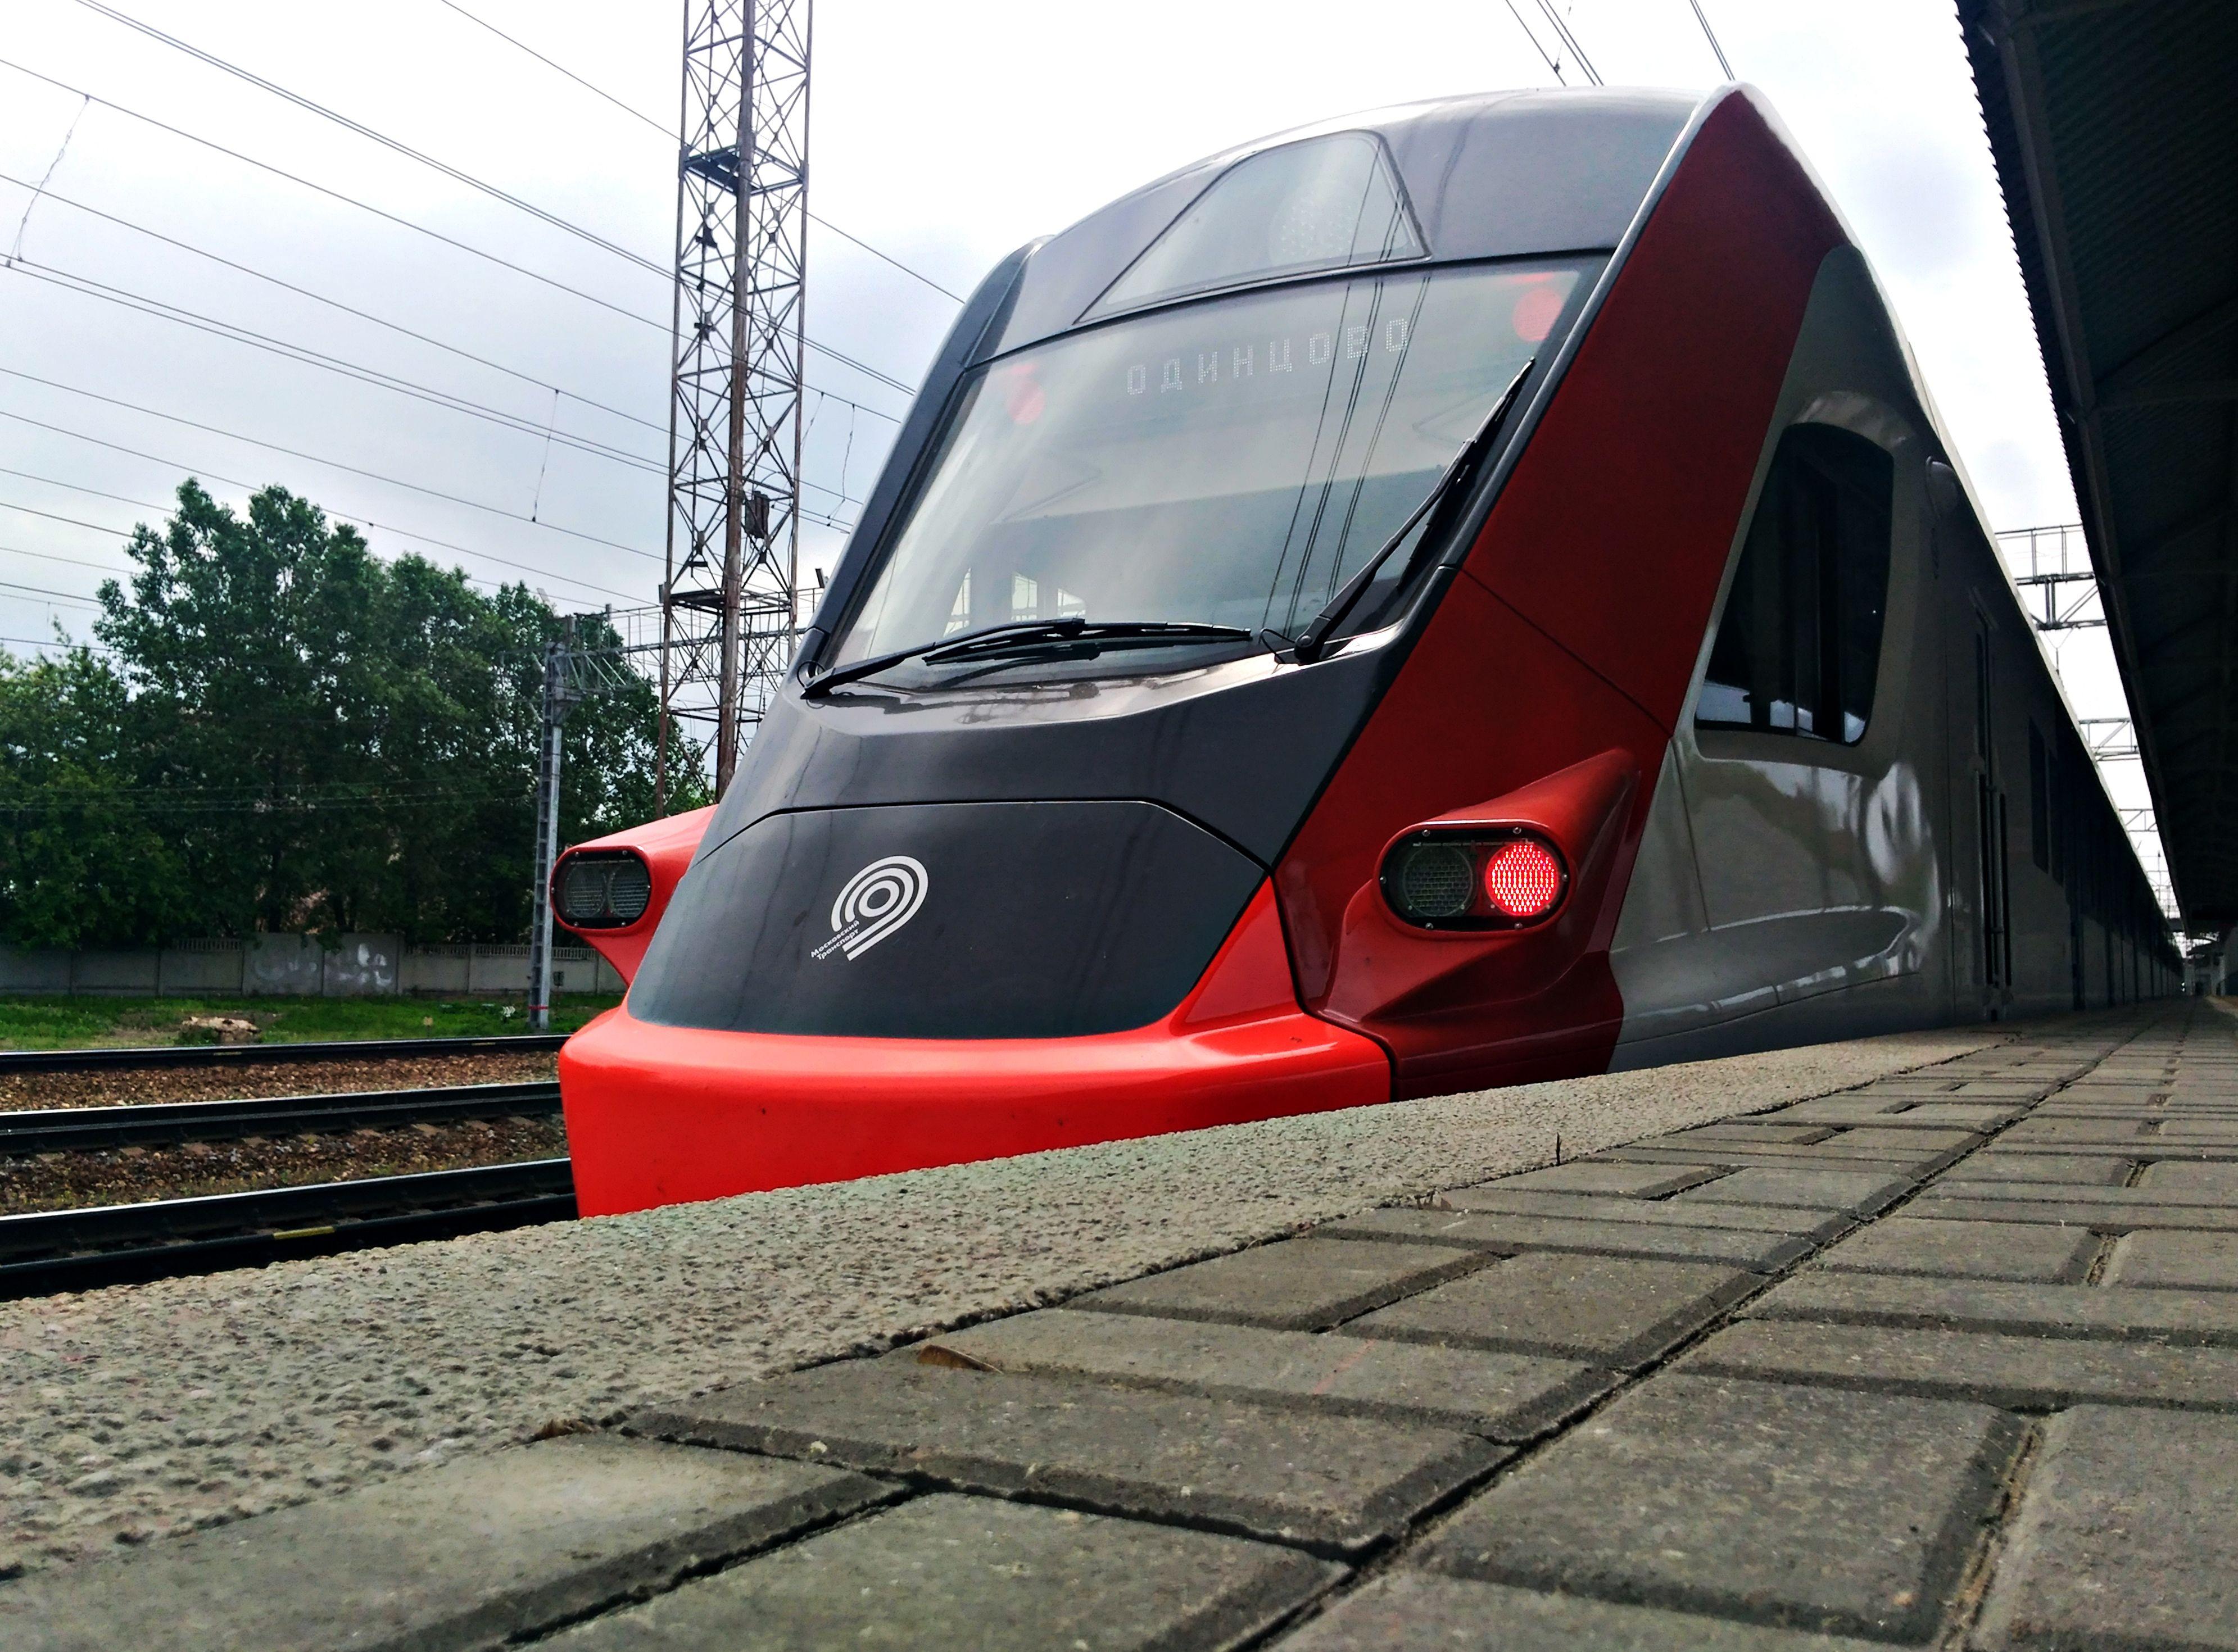 Eg2tv Na Stancii Odincovo Leto 2019 Goda Outdoor Gear Train Outdoor